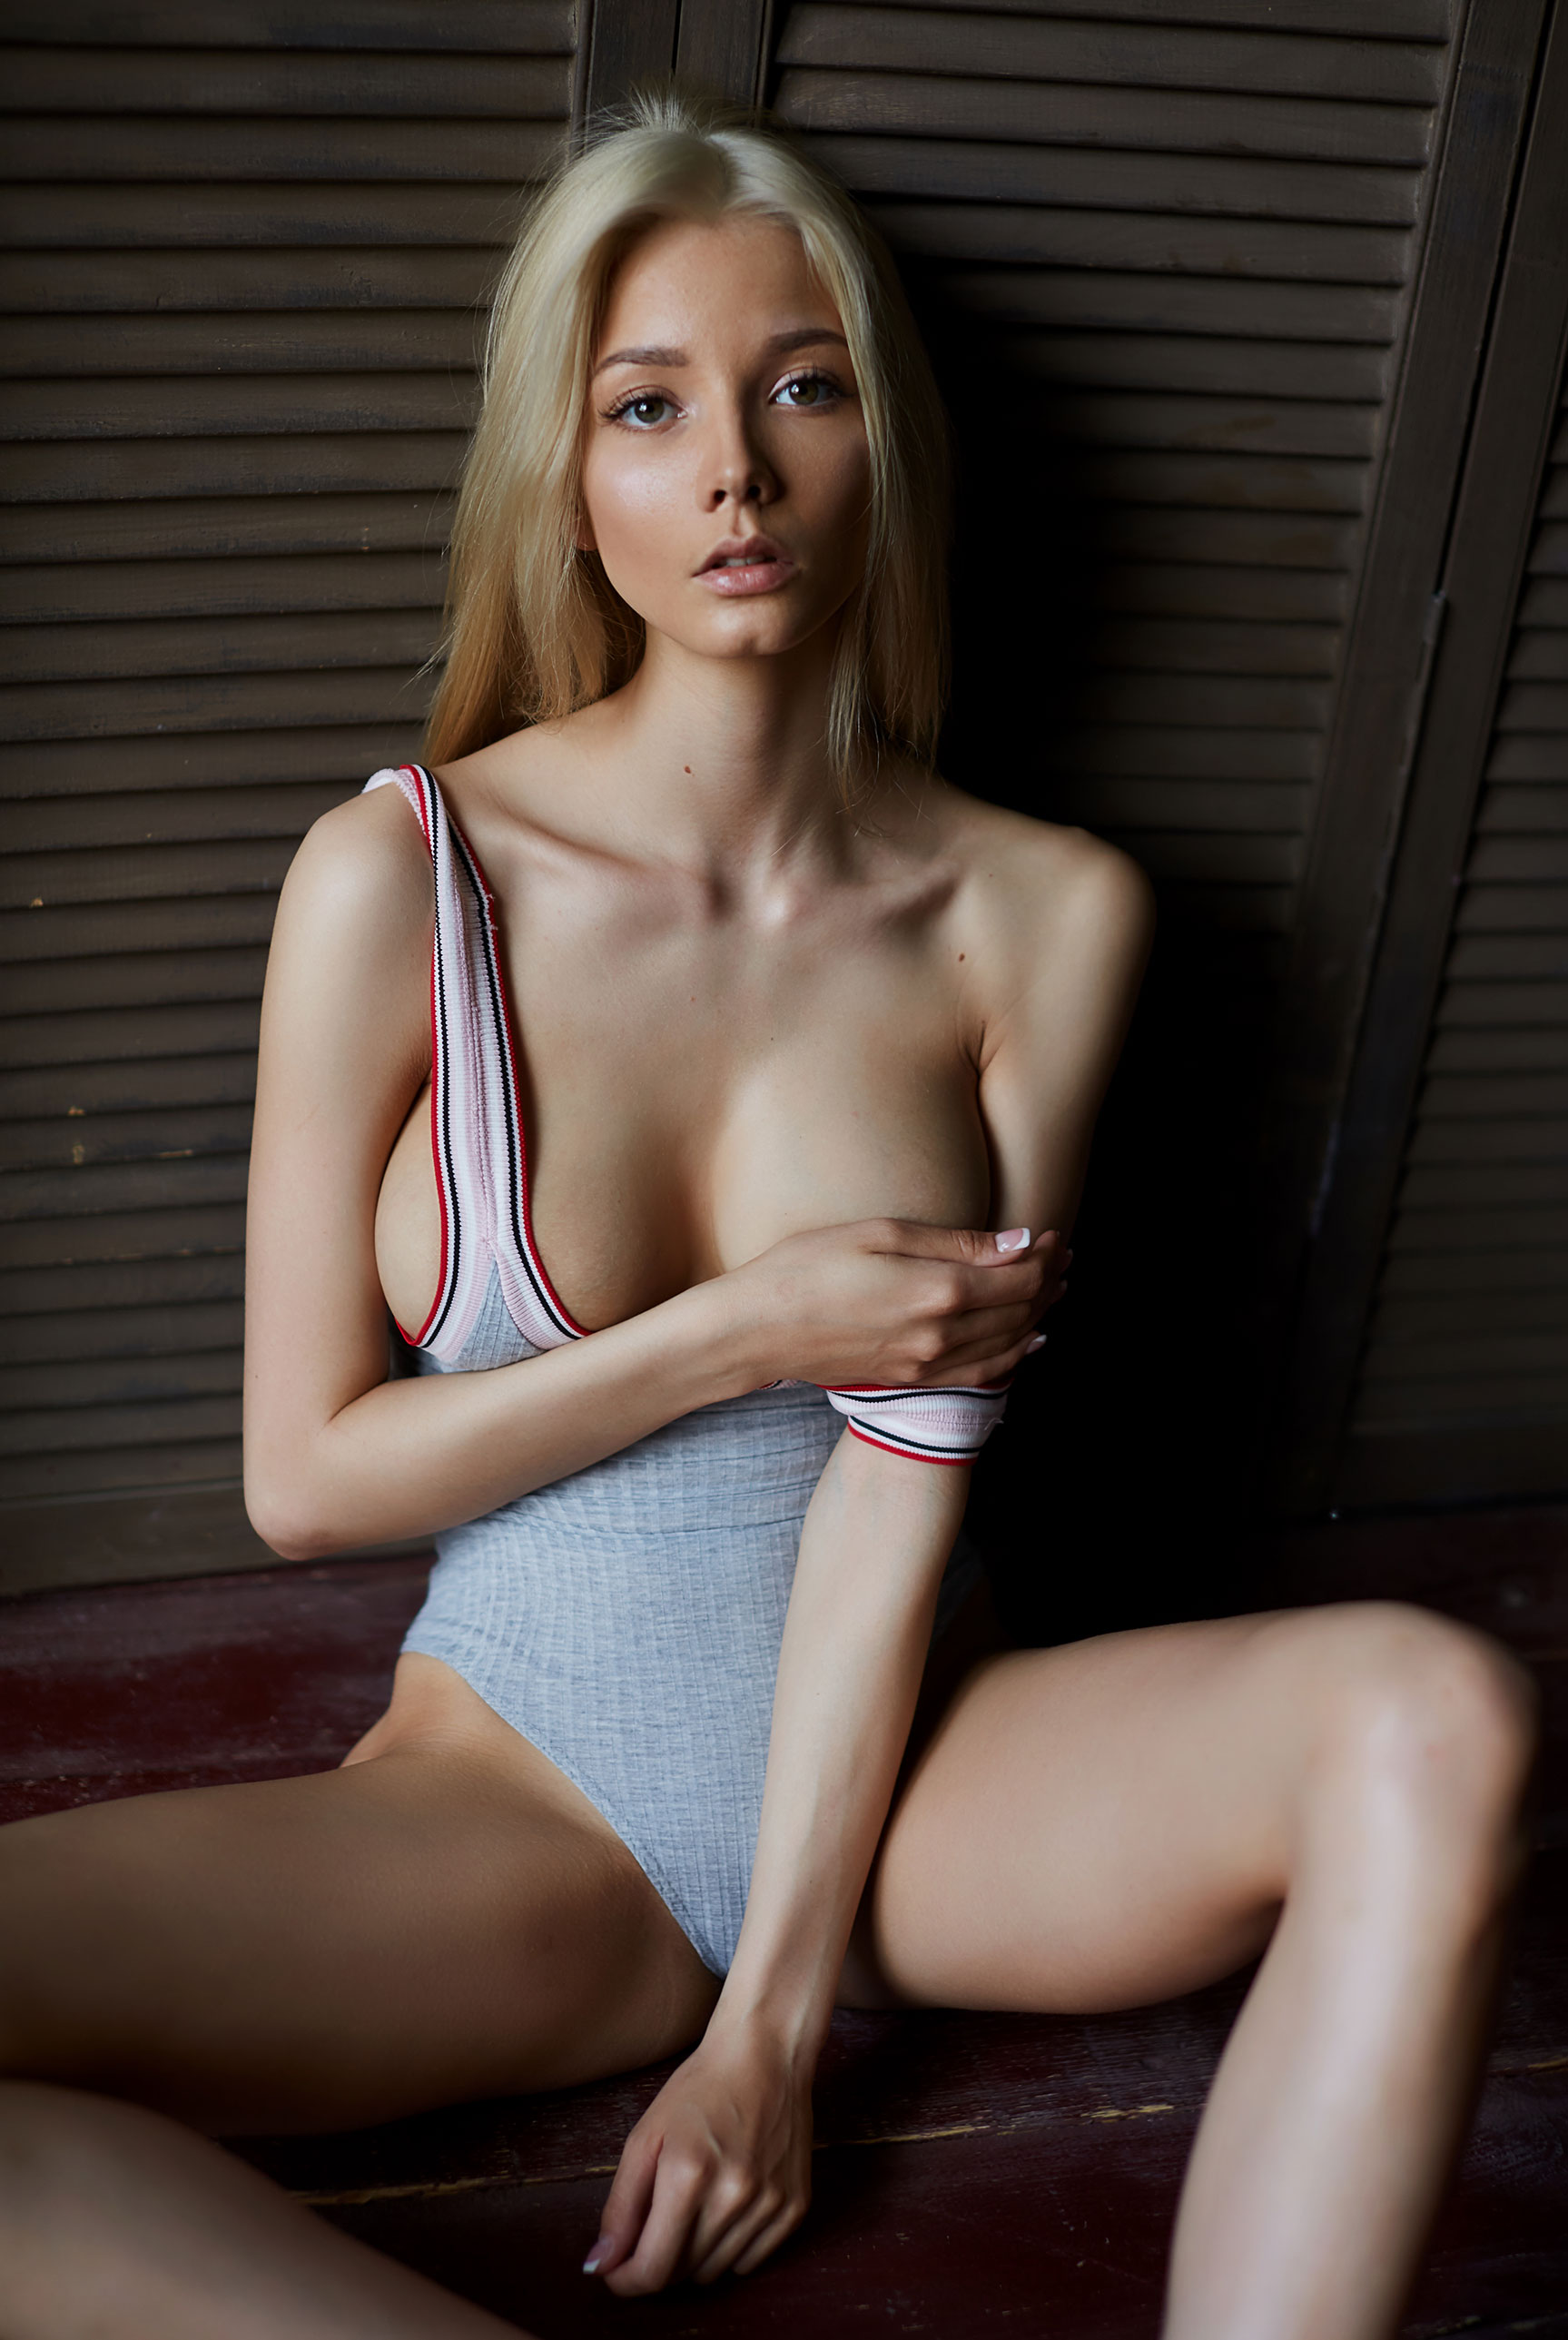 Катерина Ширяева / Ekaterina Chernisheva by Dmitriy Lobanov